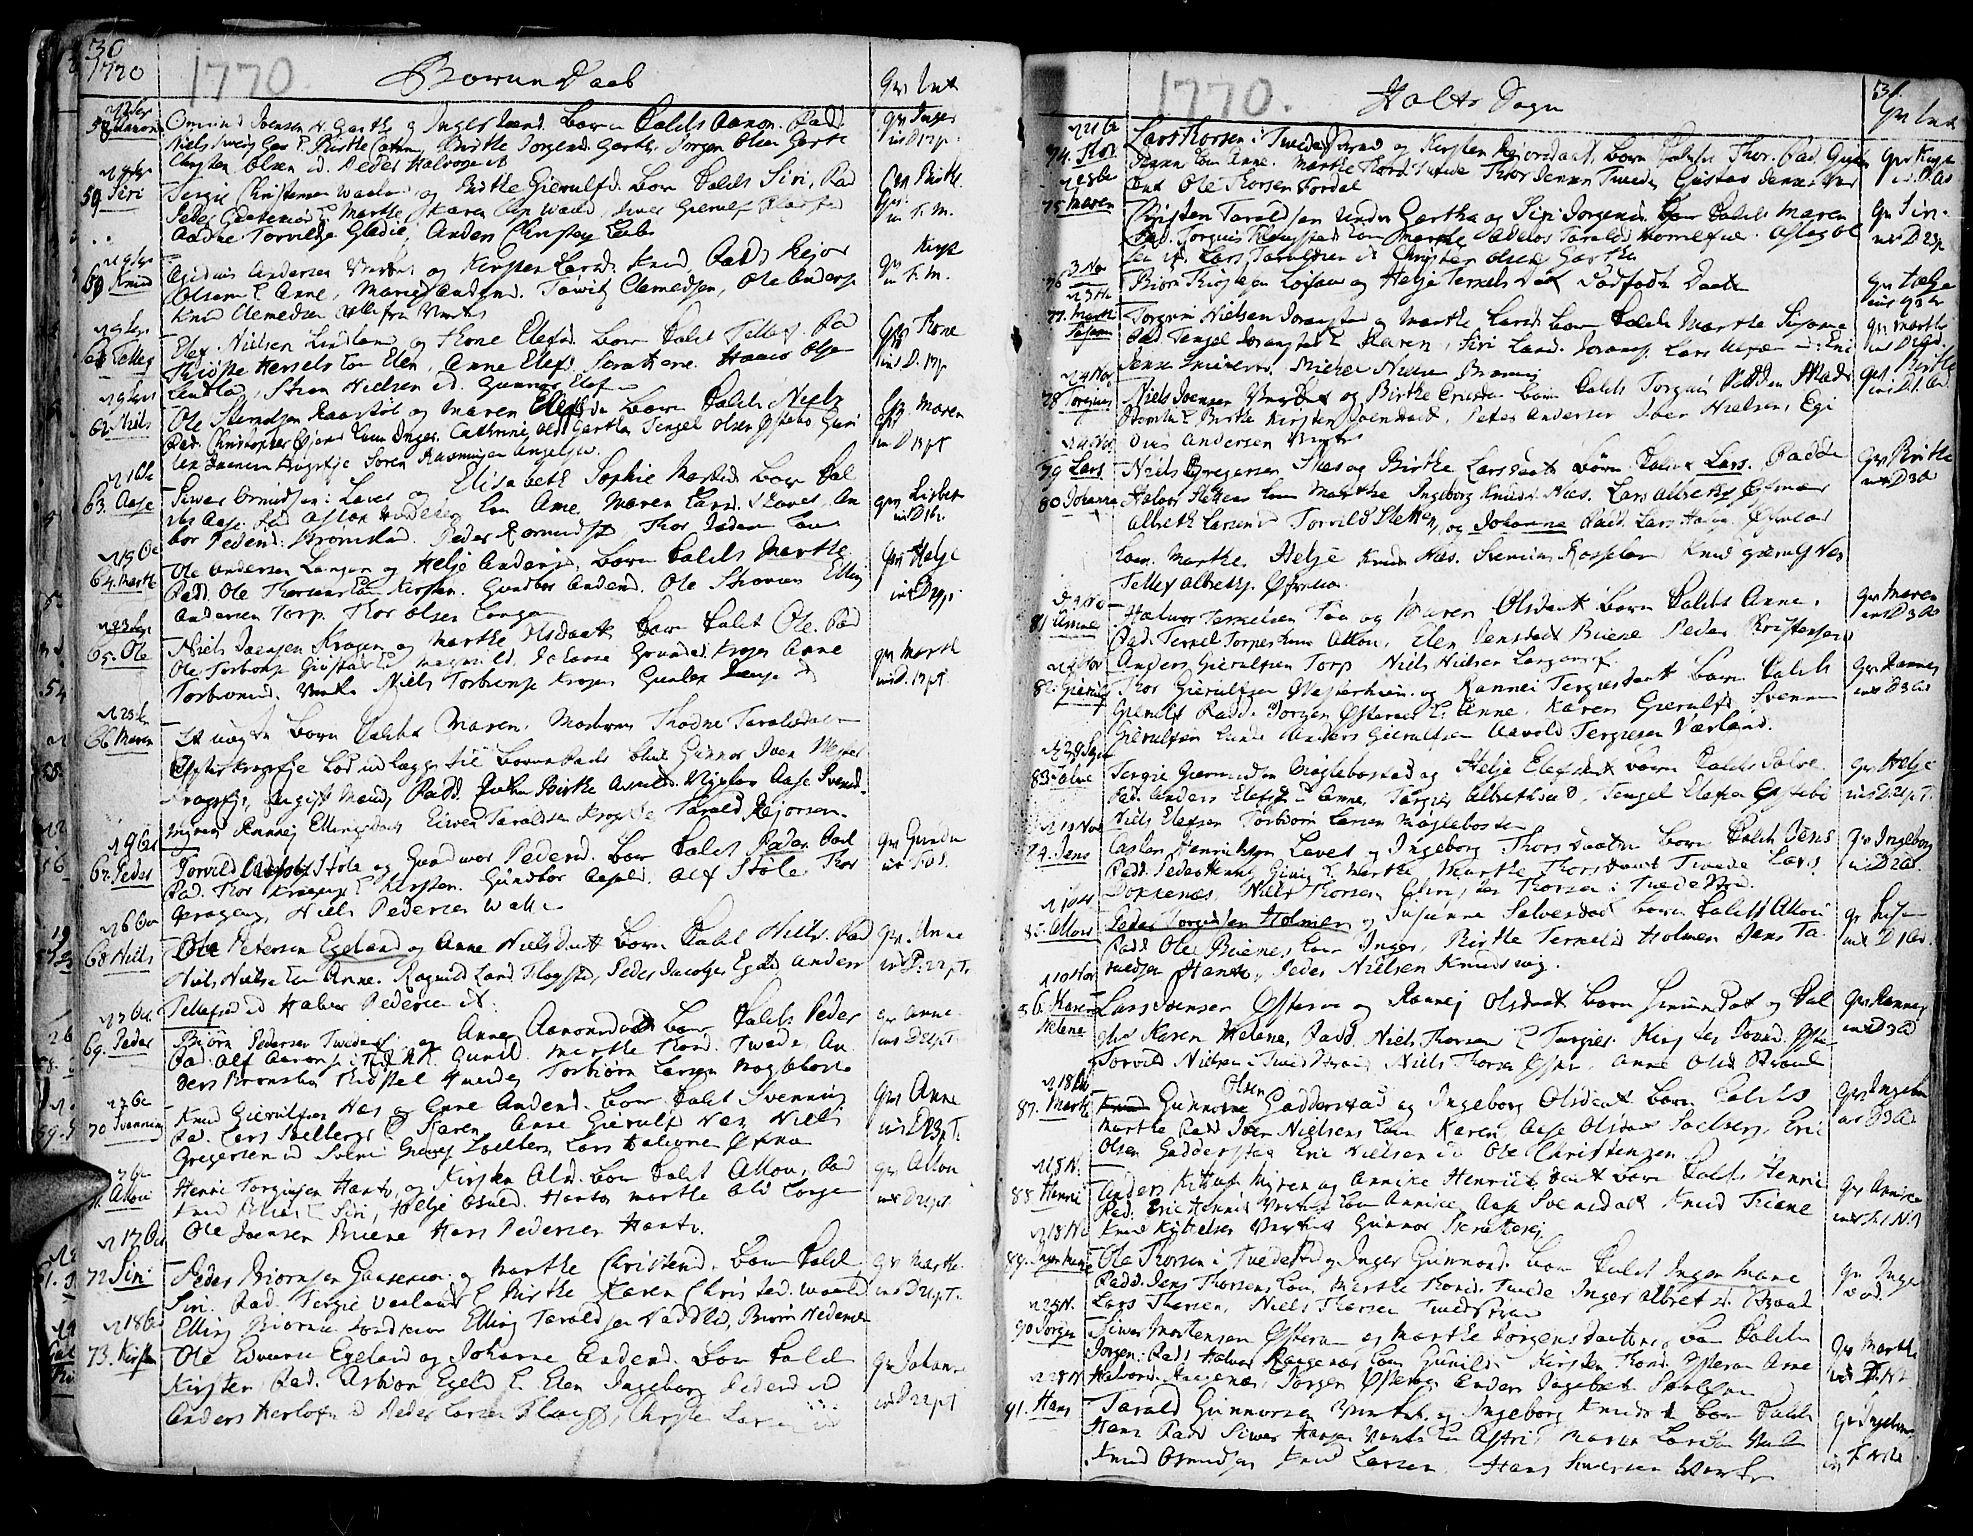 SAK, Holt sokneprestkontor, F/Fa/L0003: Ministerialbok nr. A 3, 1765-1798, s. 30-31